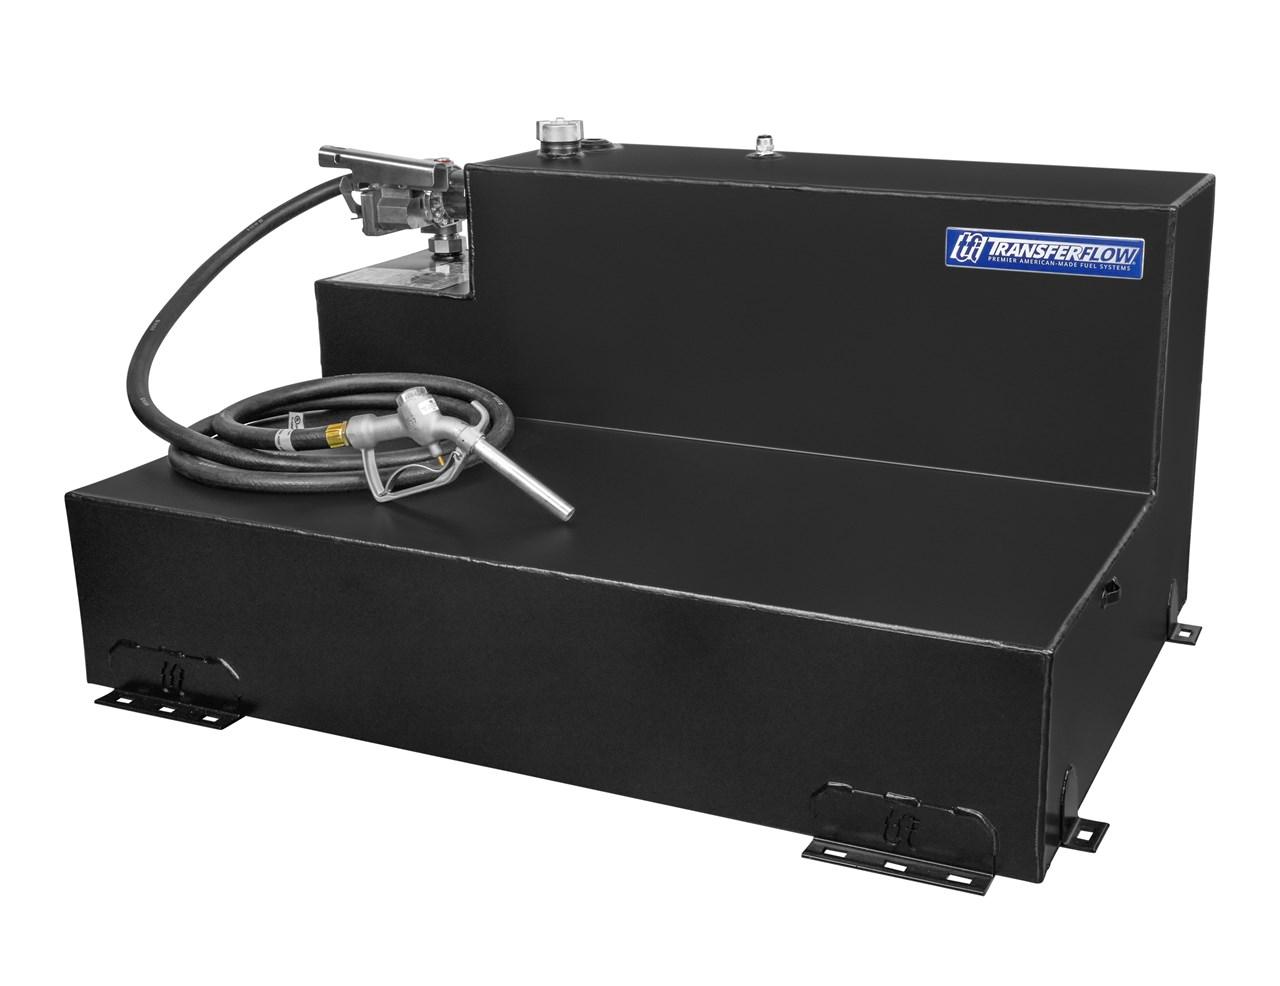 100 Gallon L Shaped Refueling Tank System Transfer Flow Inc Gas Gauge Fuel Pump Wire Harness